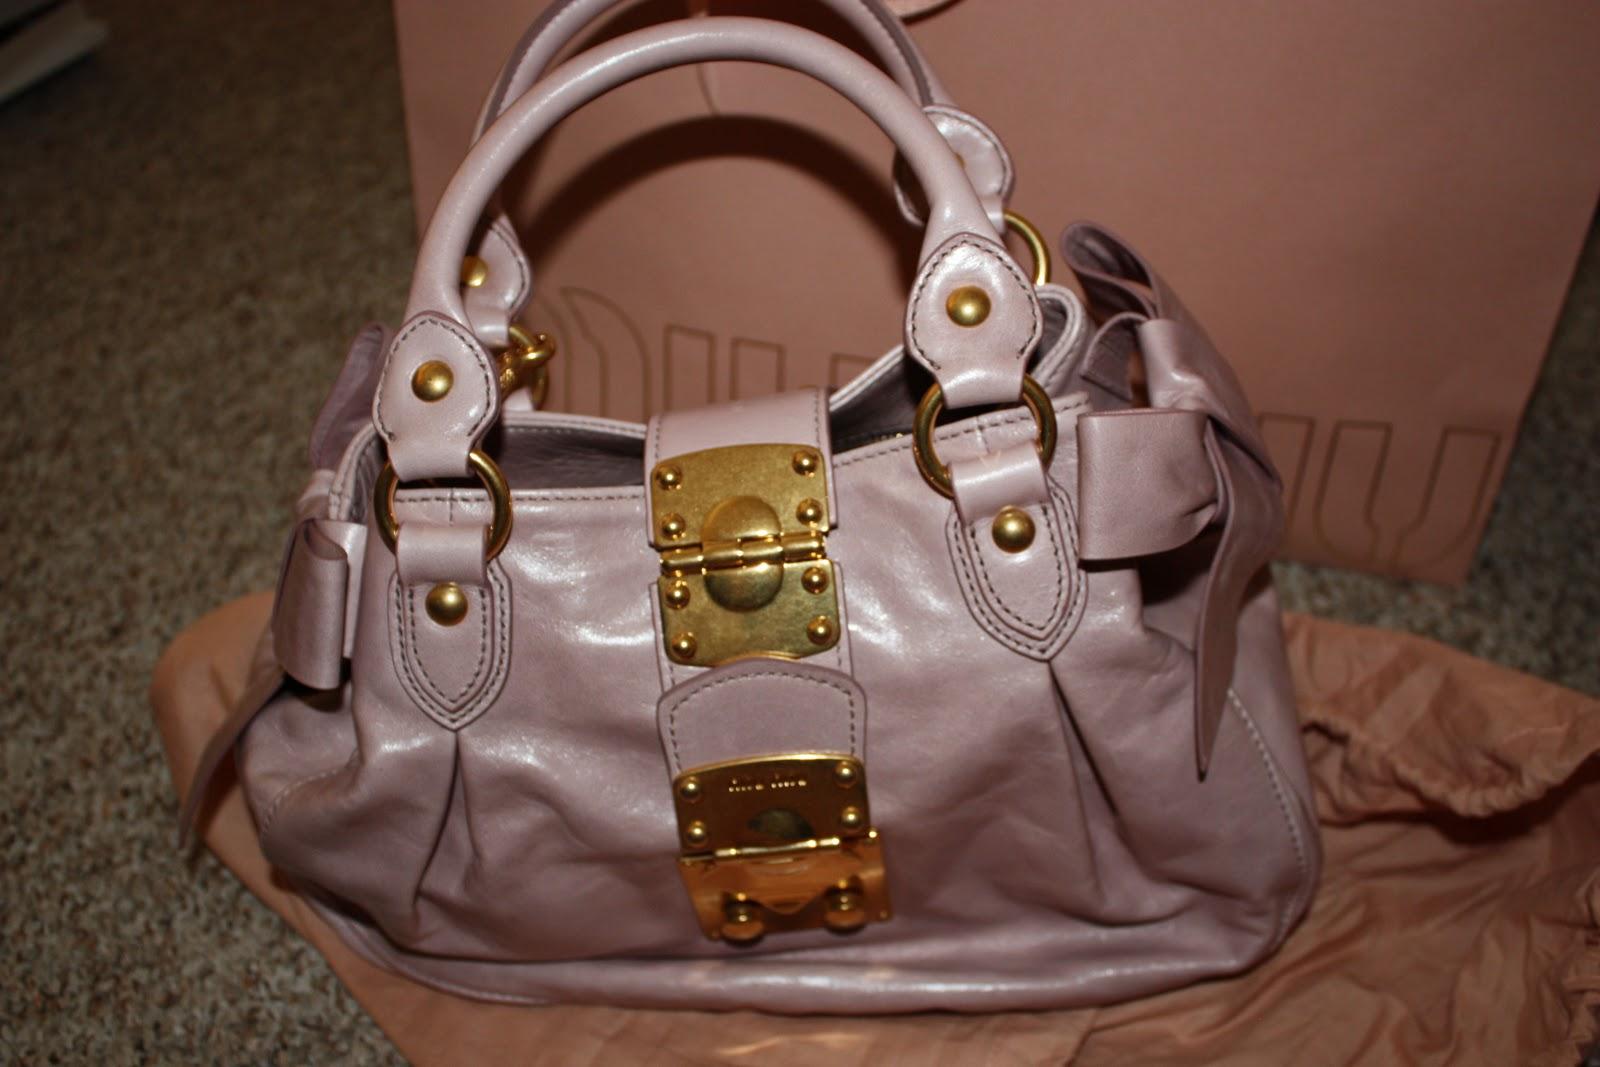 9f1c95ce64b MIU MIU Nappa Matelasse Tote Loto 105513 missklicious  Miu Miu bow bag - In  love!